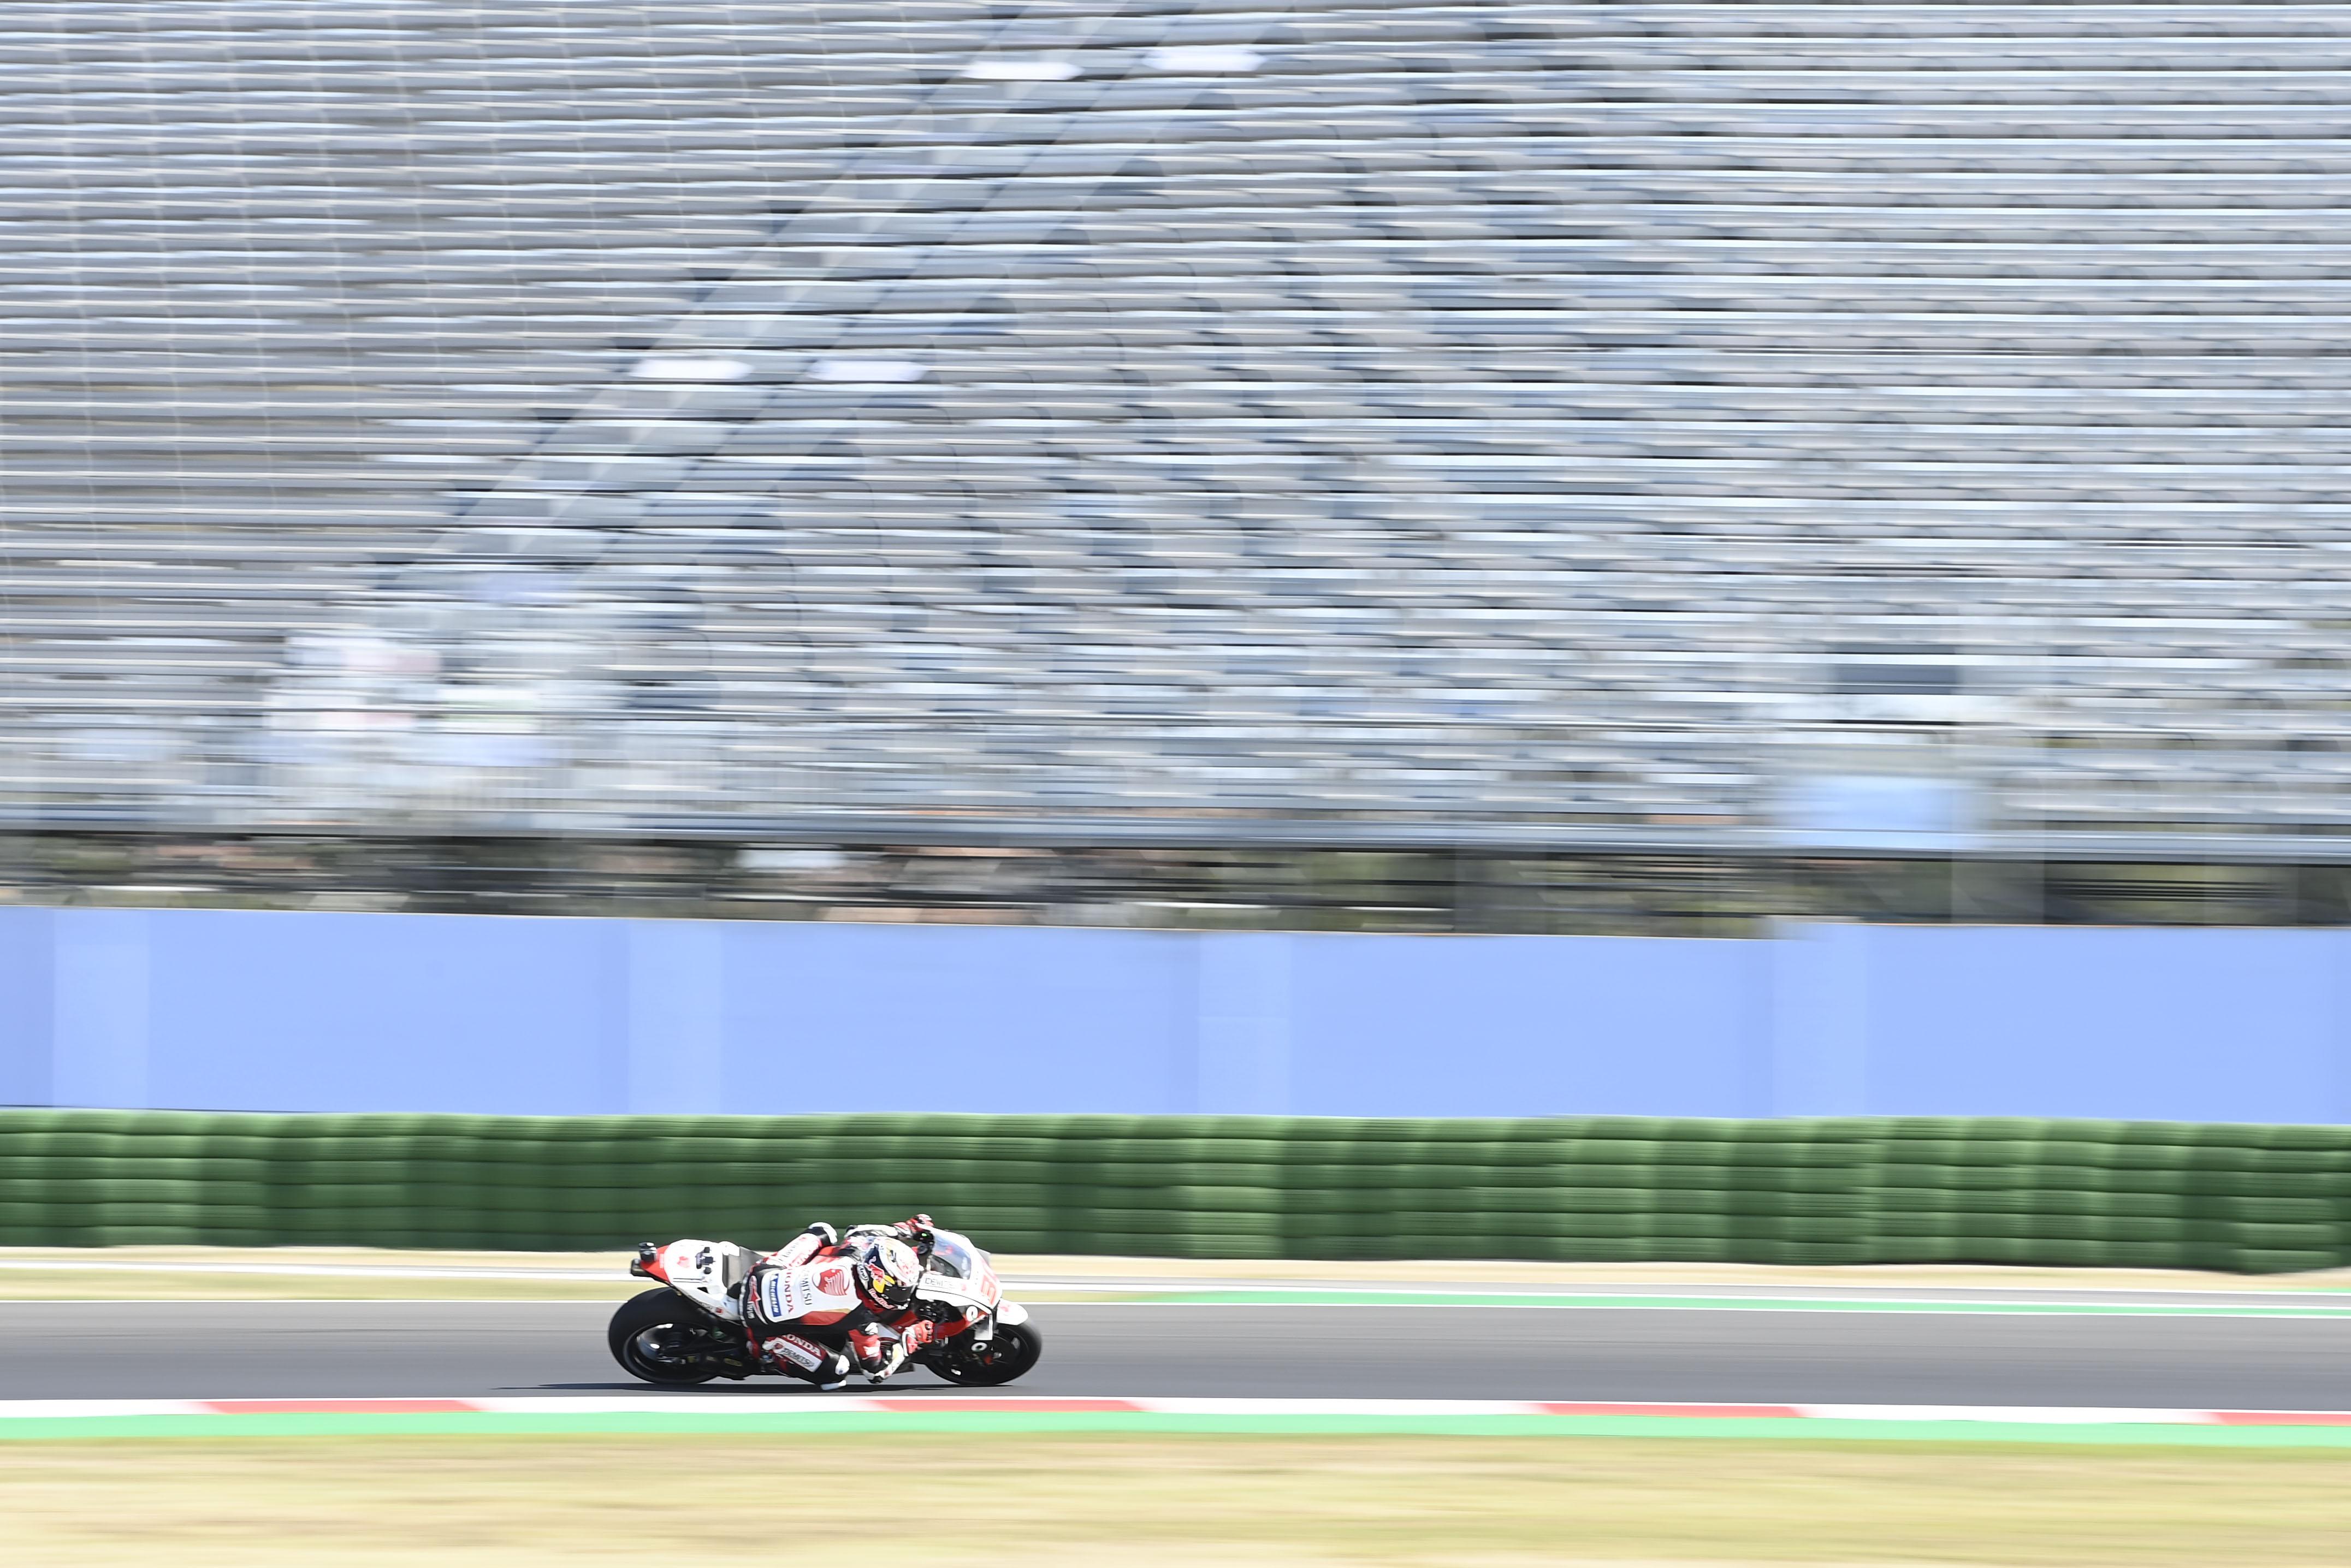 Takaaki Nakagami LCR Honda Misano MotoGP 2020